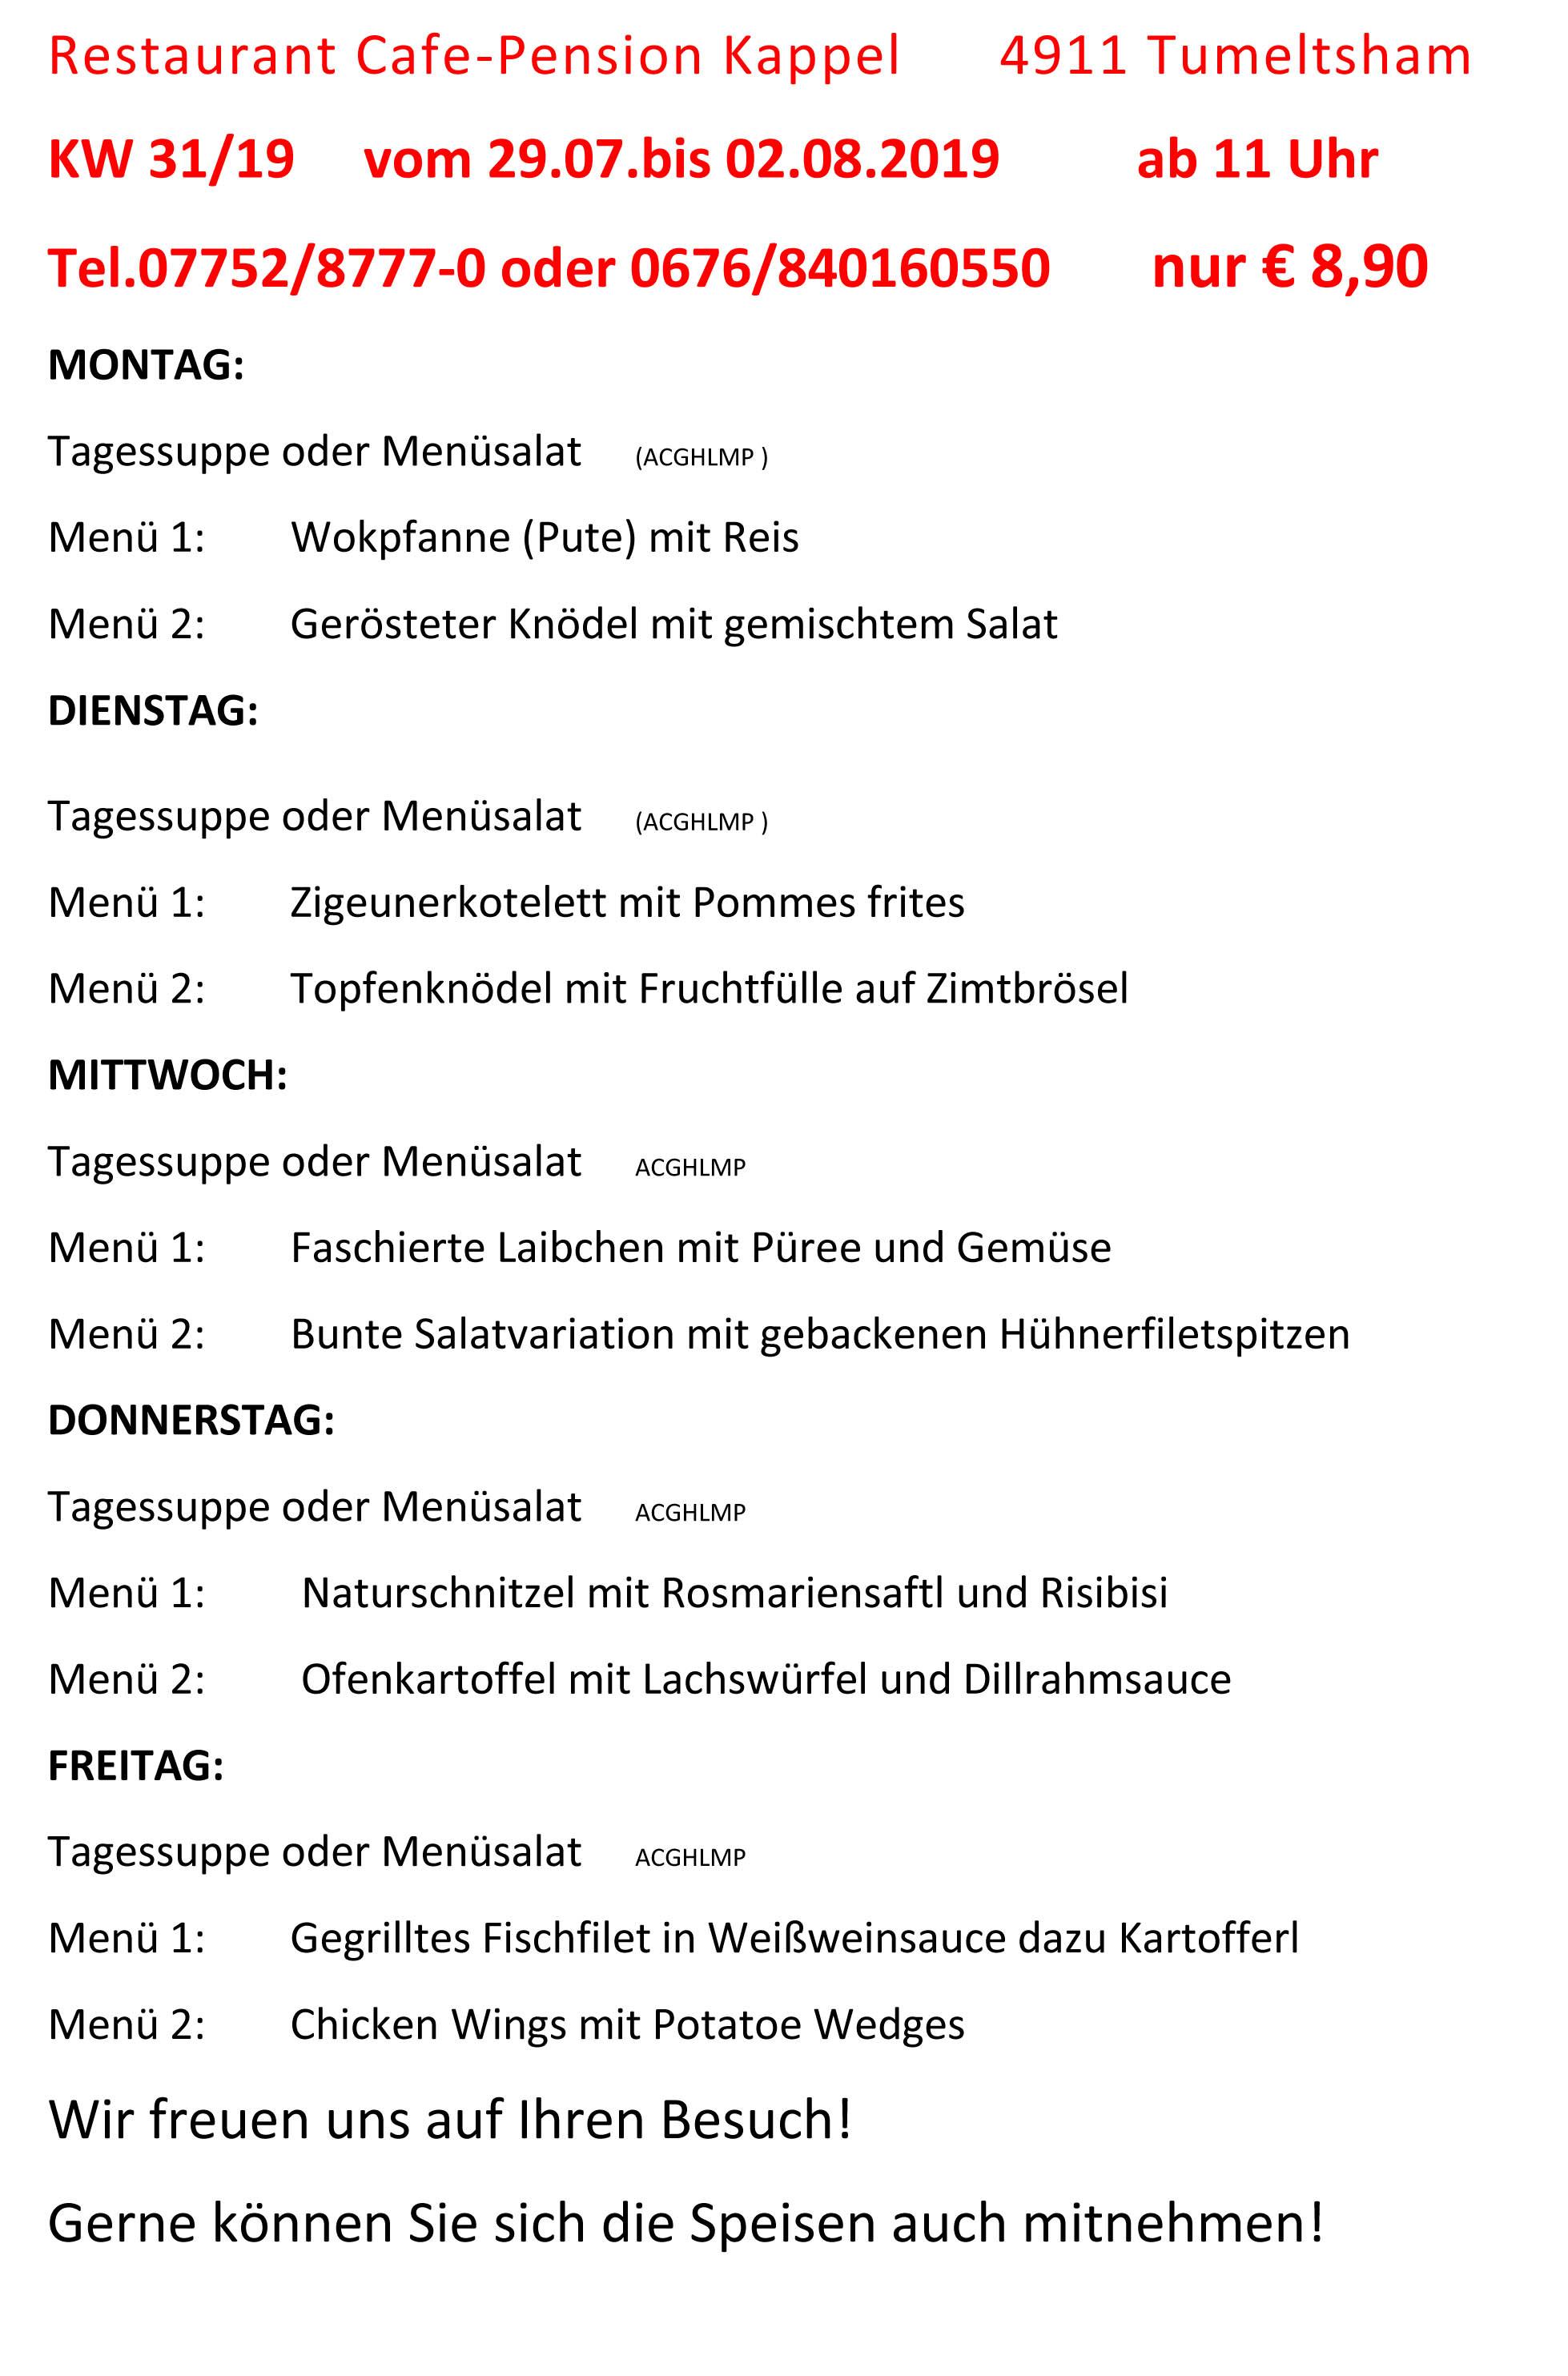 Menüplan KW 31-19neudocx (1)